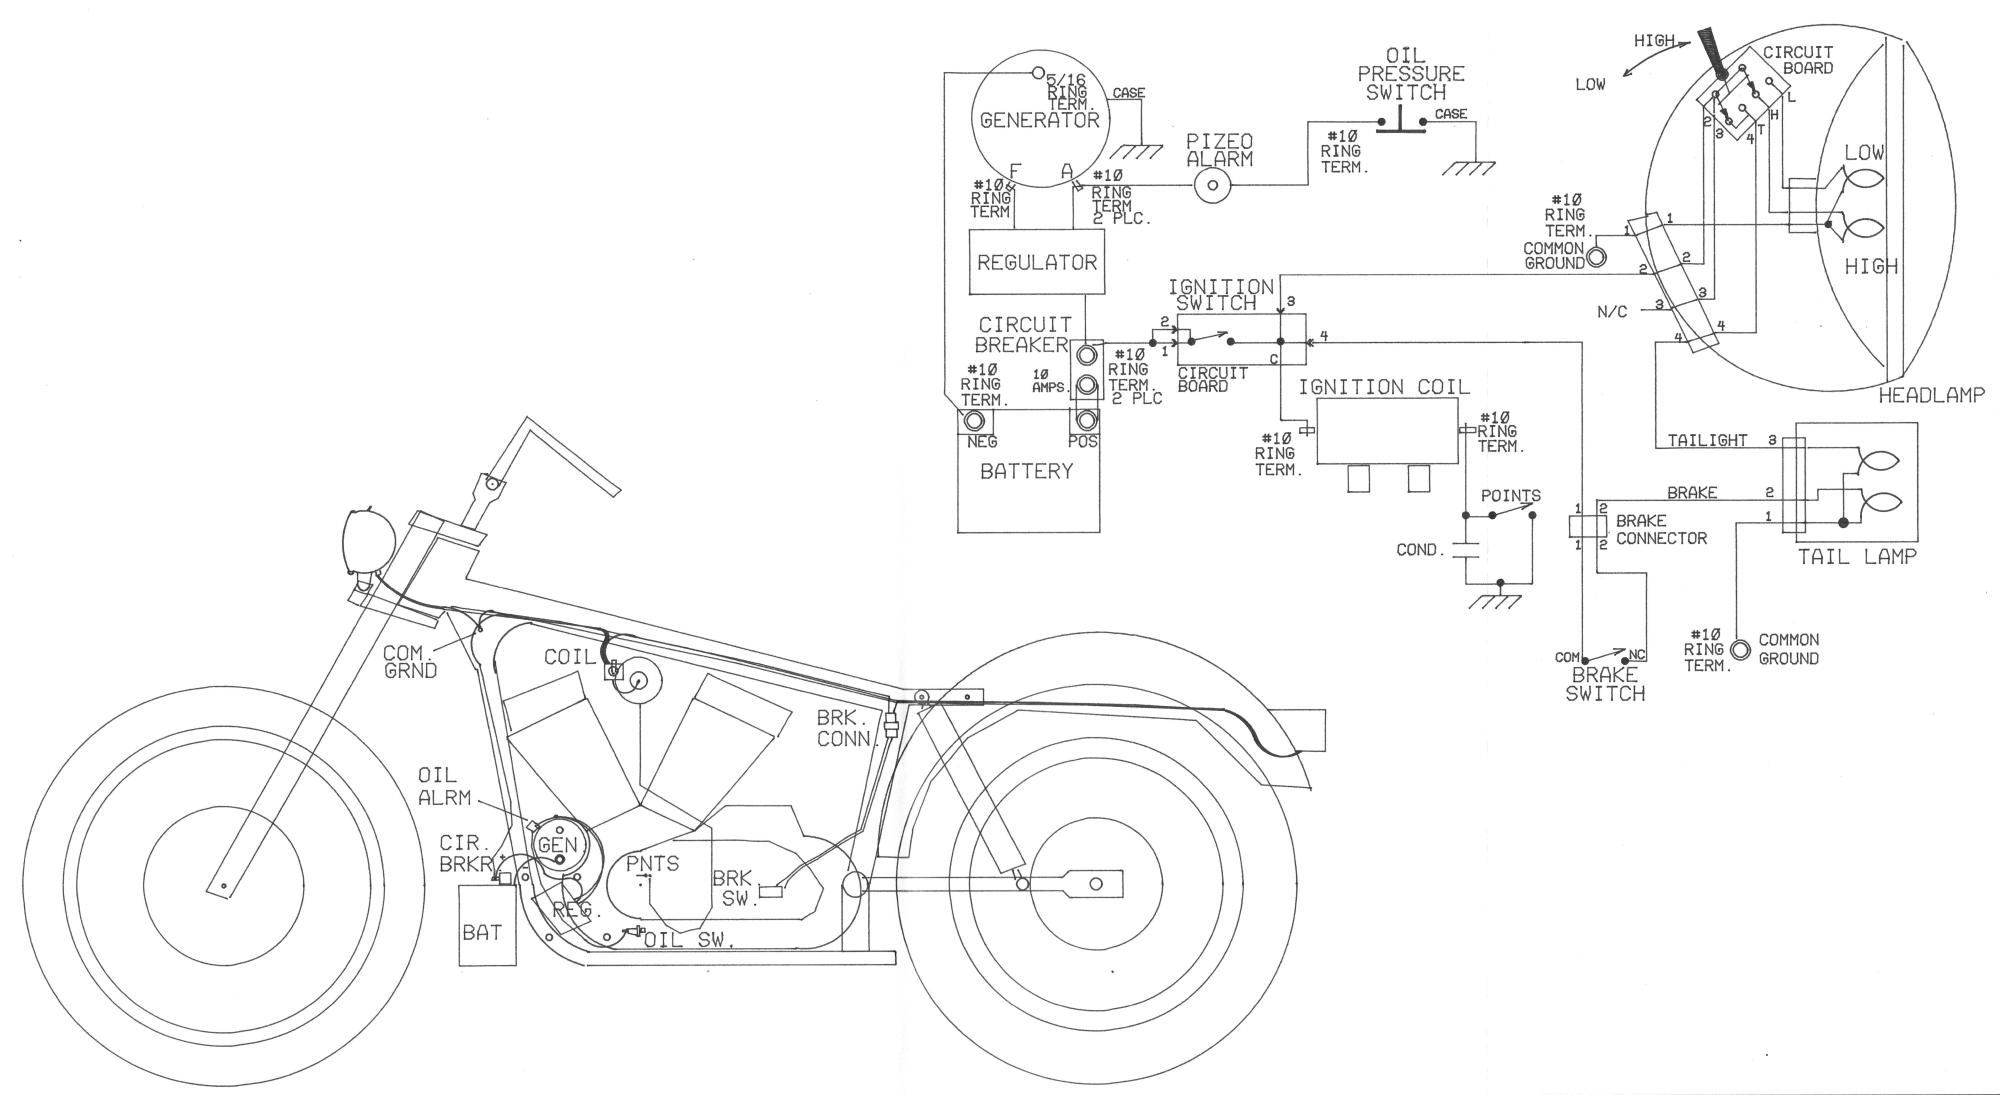 hight resolution of 1996 harley sportster wiring diagram auto electrical wiring diagram u2022 1987 harley sportster wiring diagram